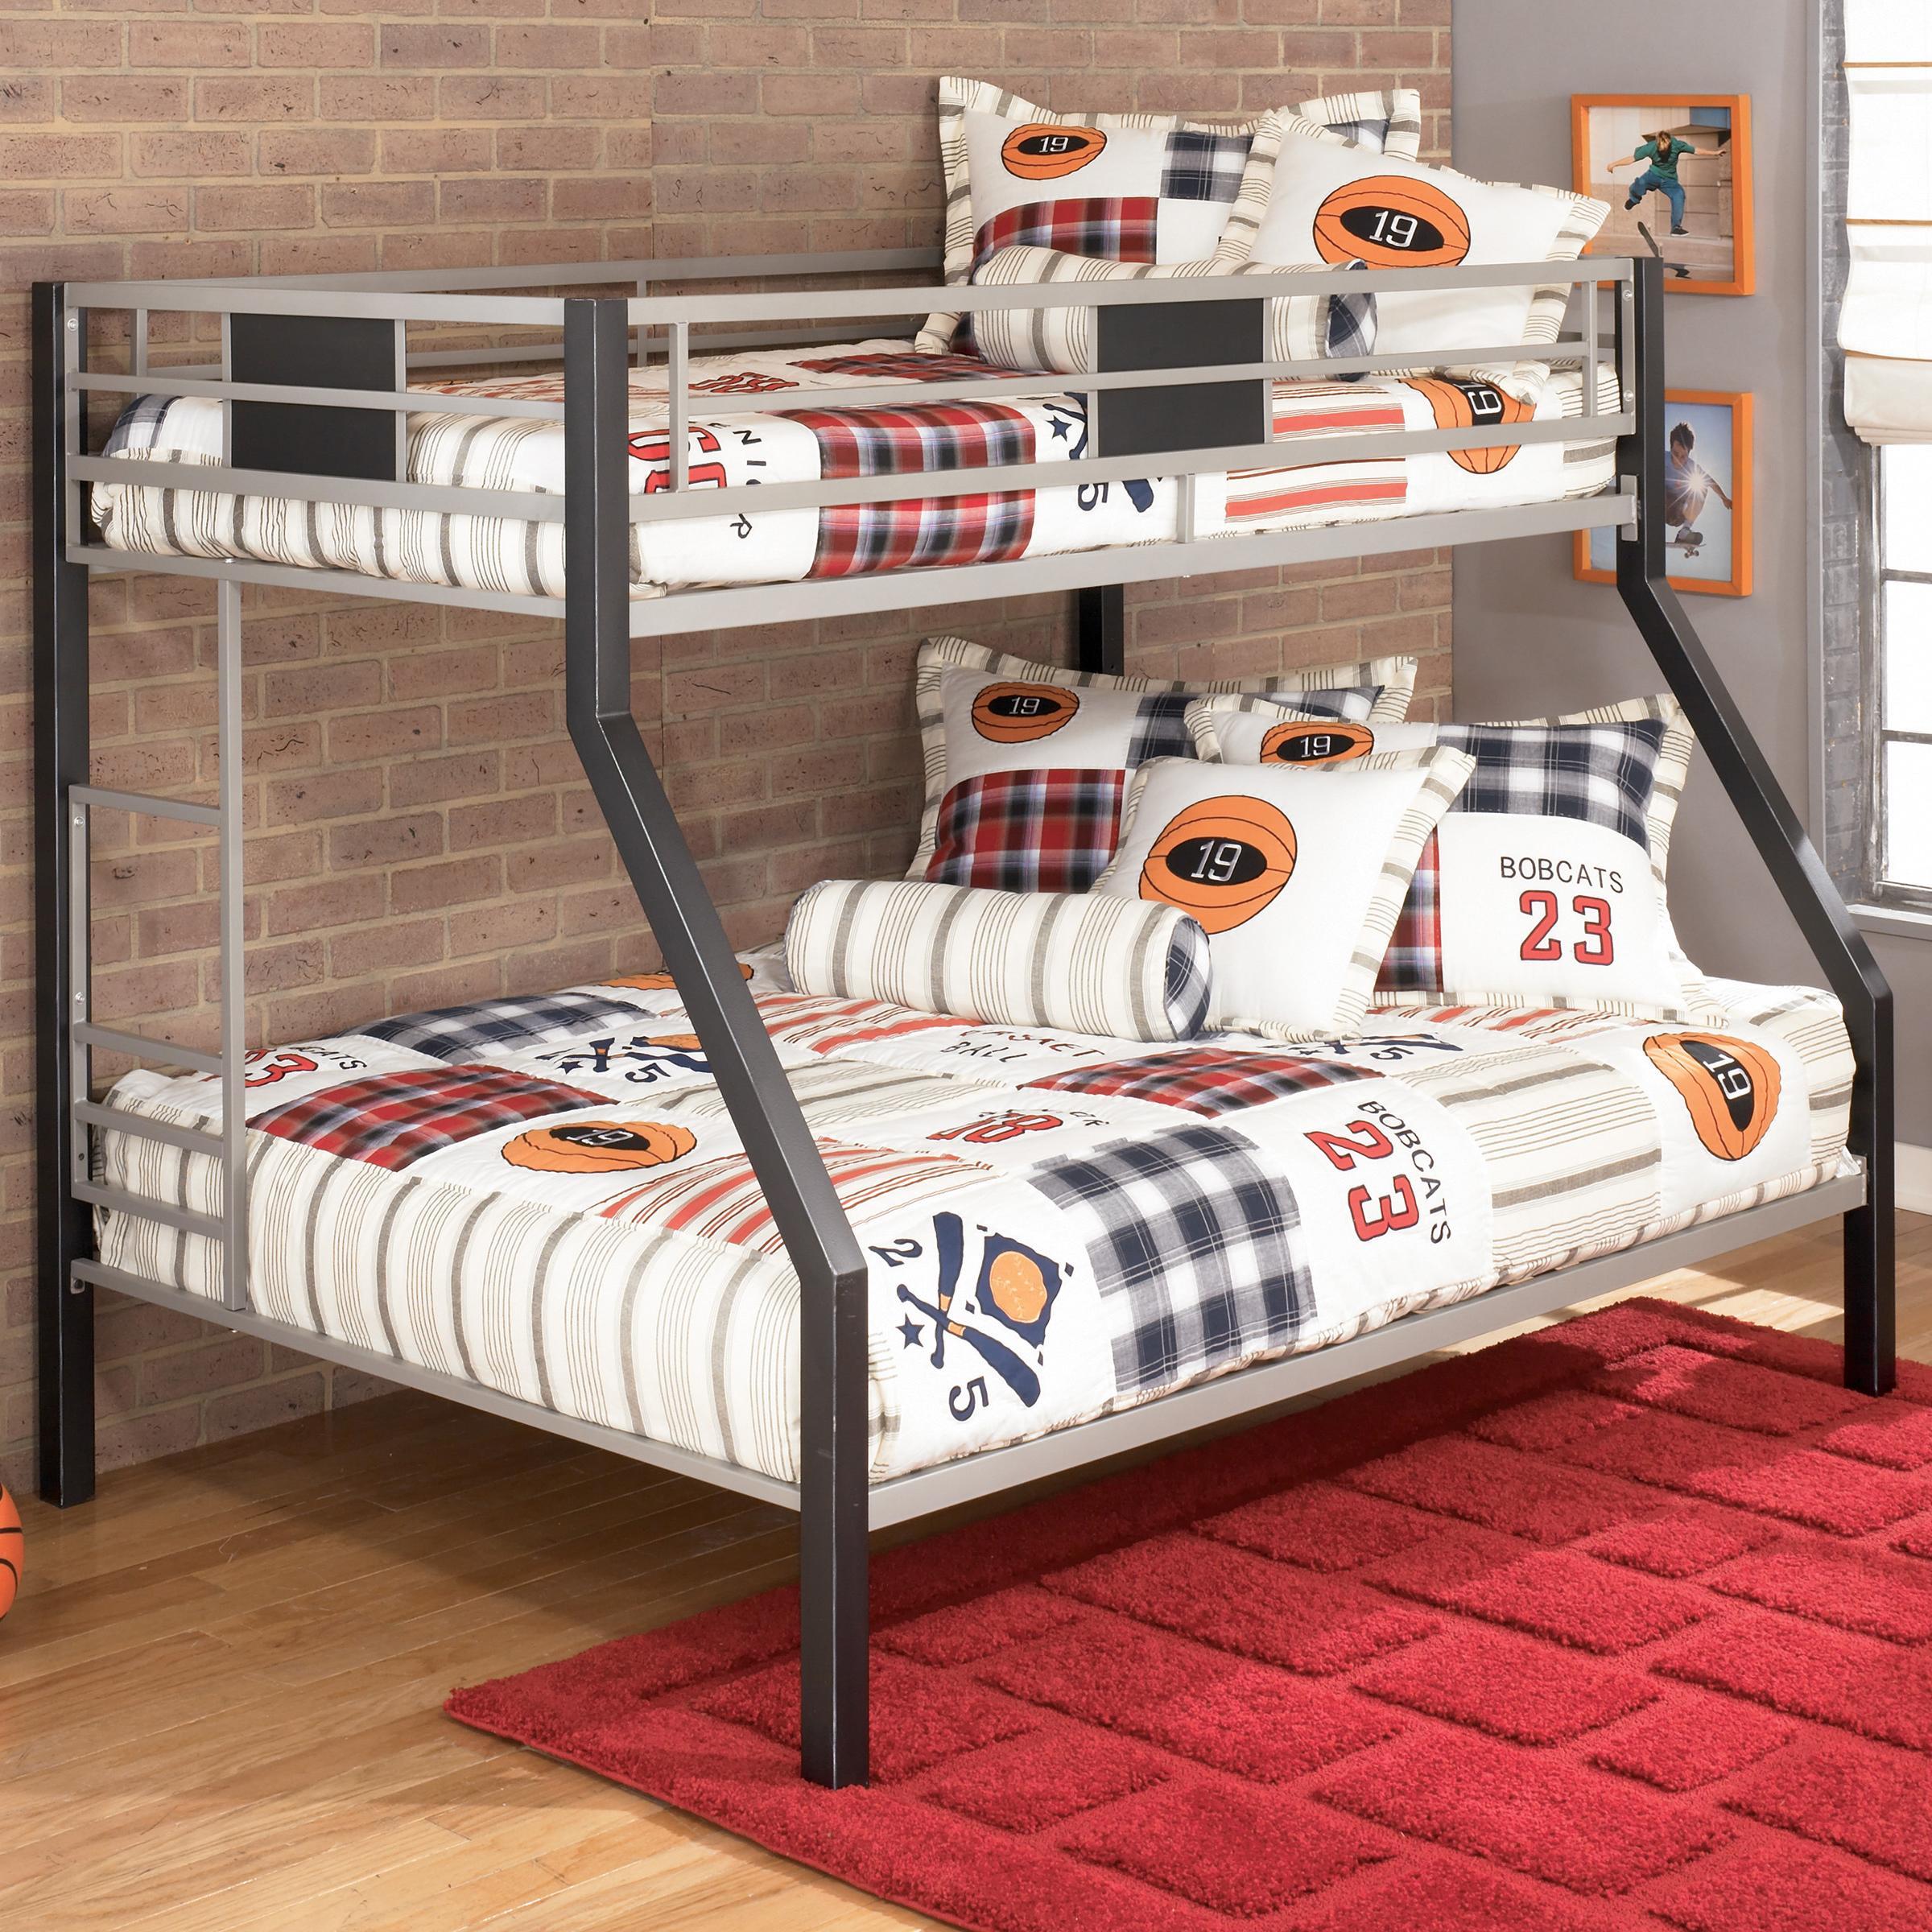 Vendor 3 Dinsmore B106 56 Twin Over Full Metal Bunk Bed Becker Furniture Bunk Beds